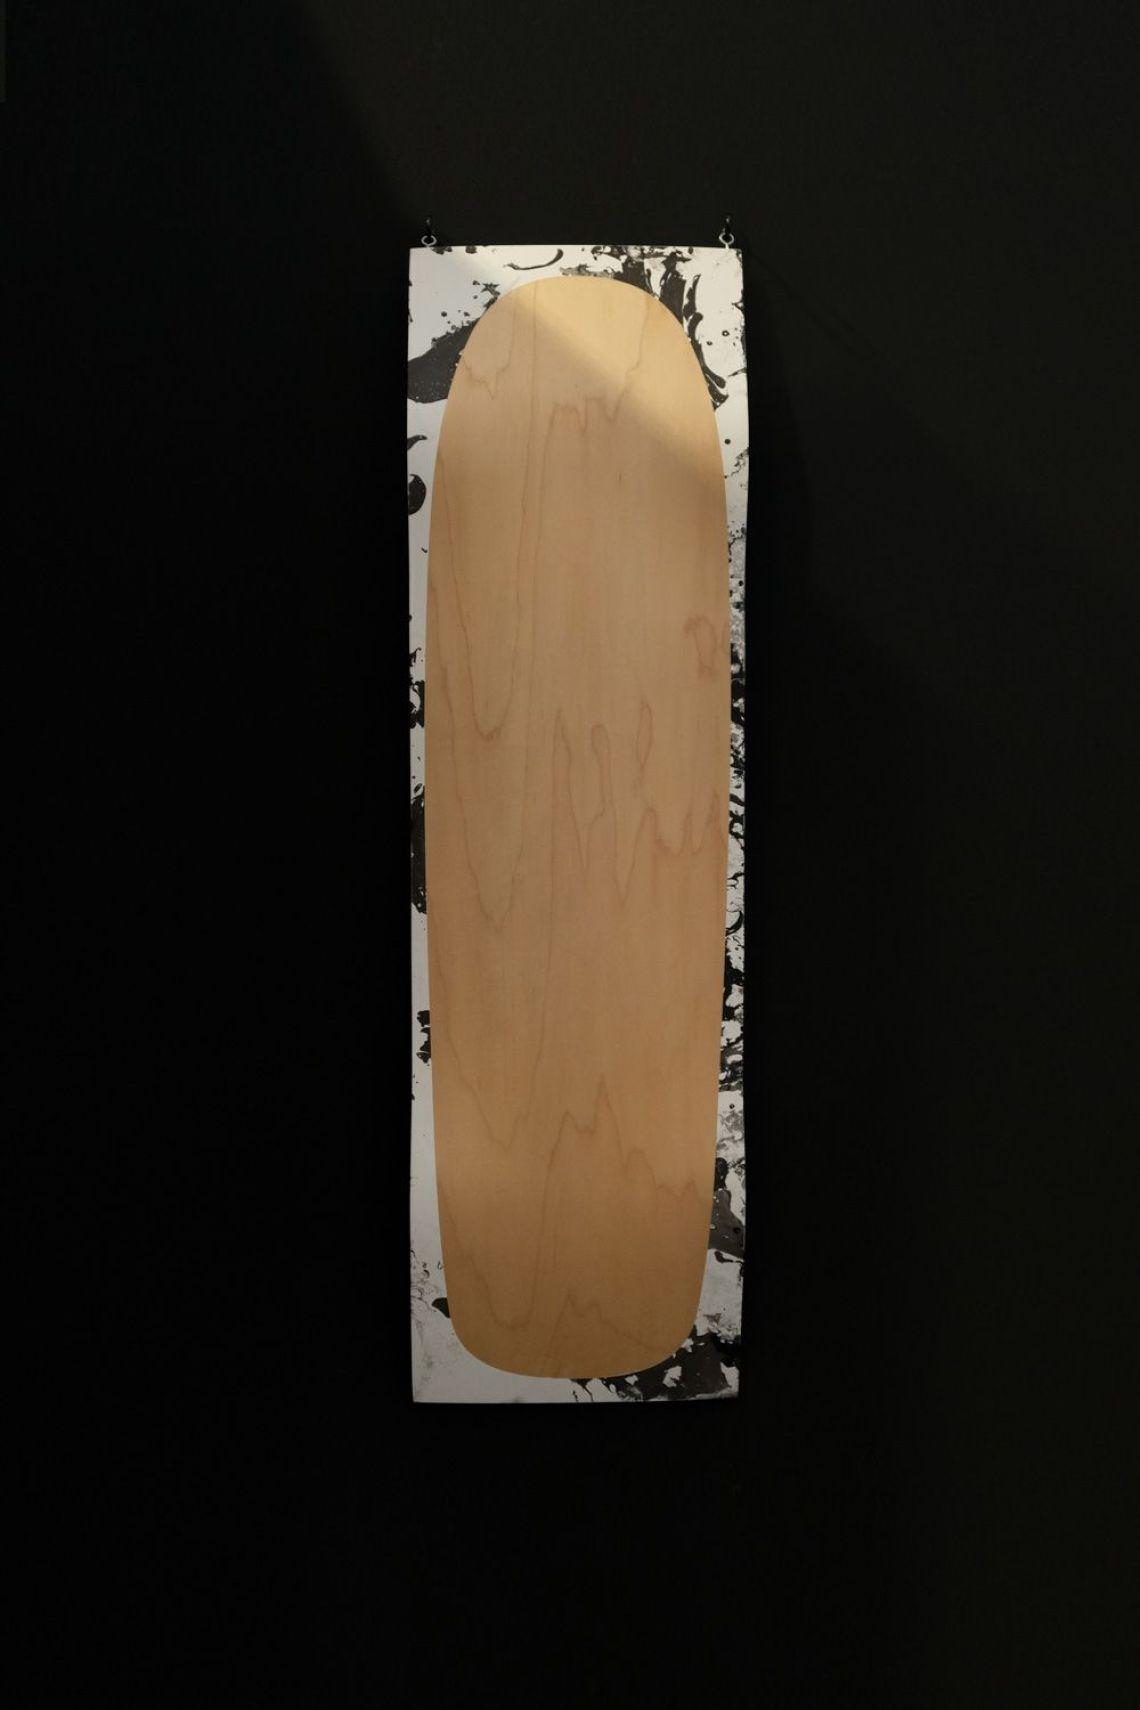 Skateboarding Is Blank Able By Decathlon 16